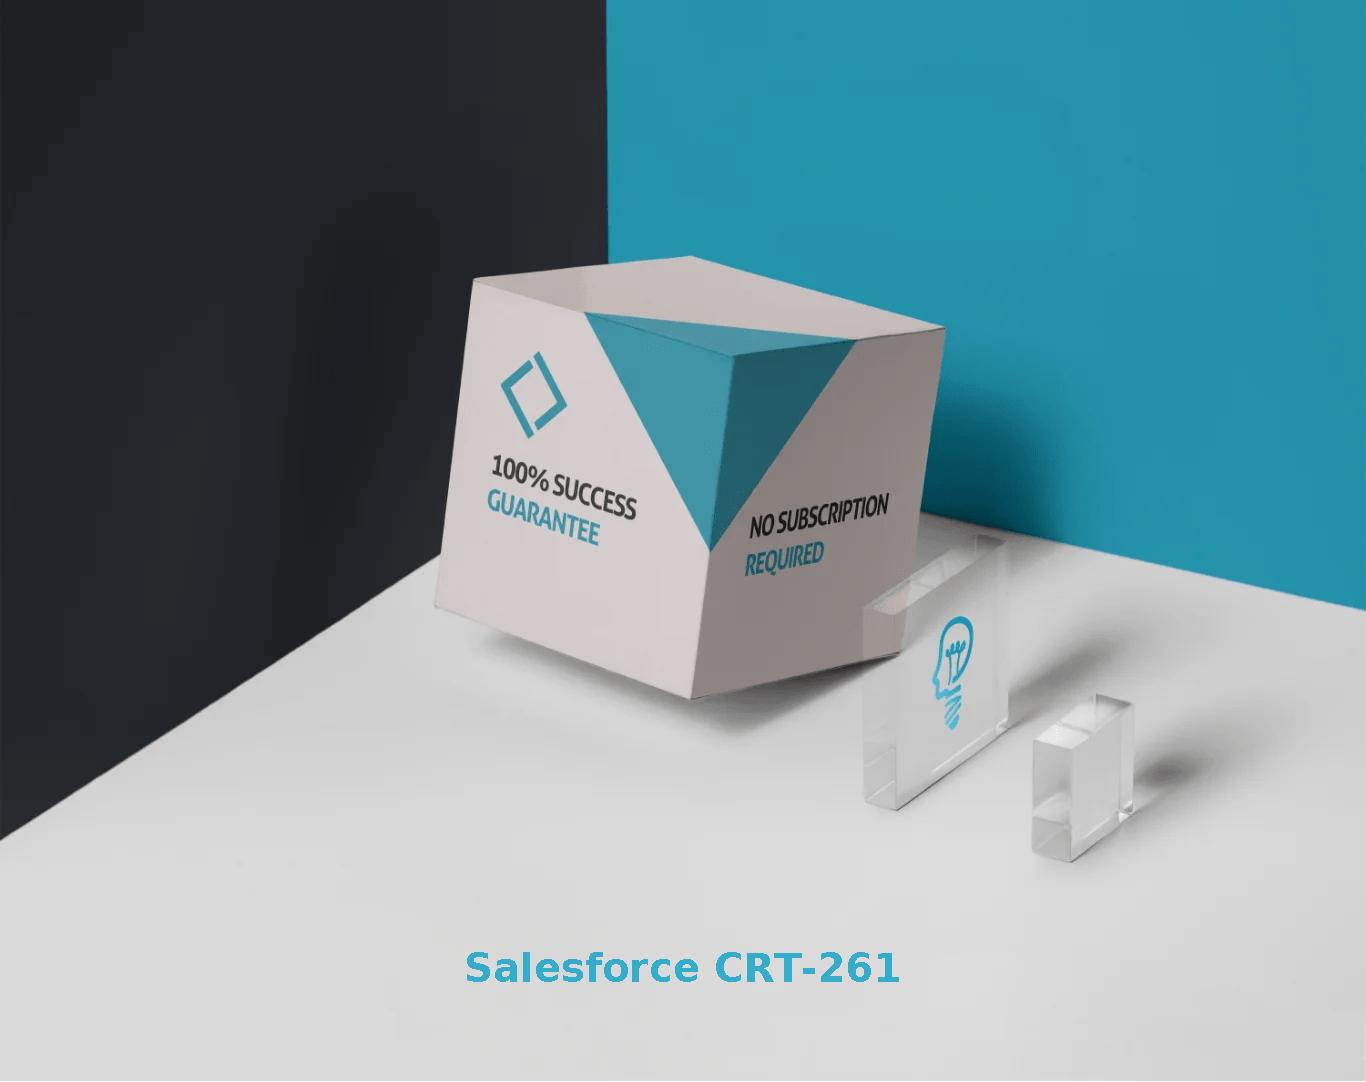 Salesforce CRT-261 Exams